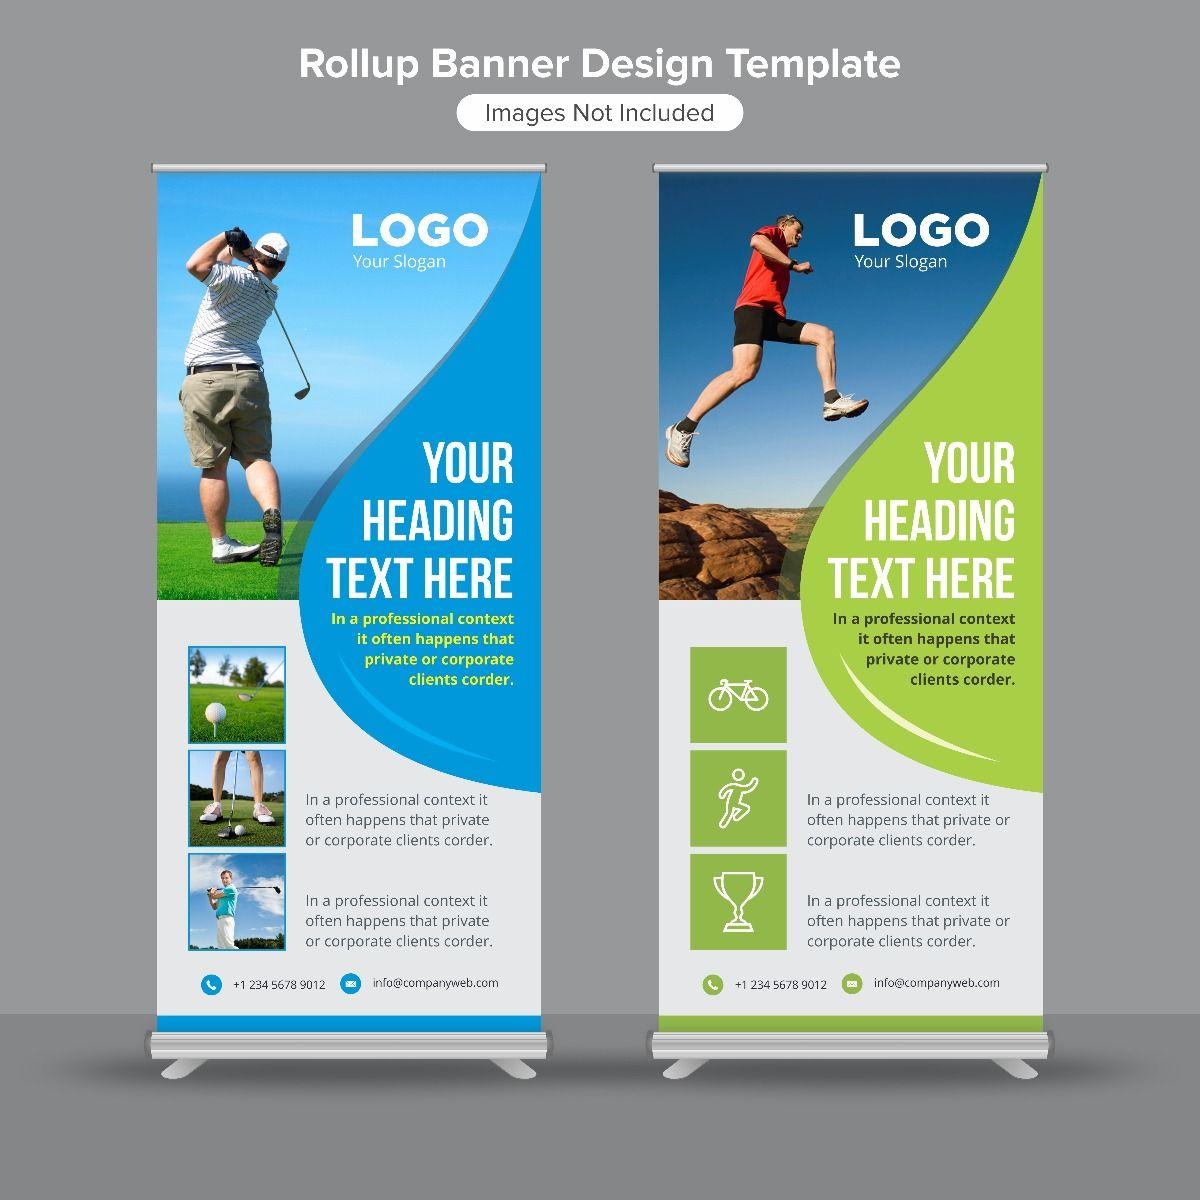 Insta Print Marketing Material Flex Standee (2*5)